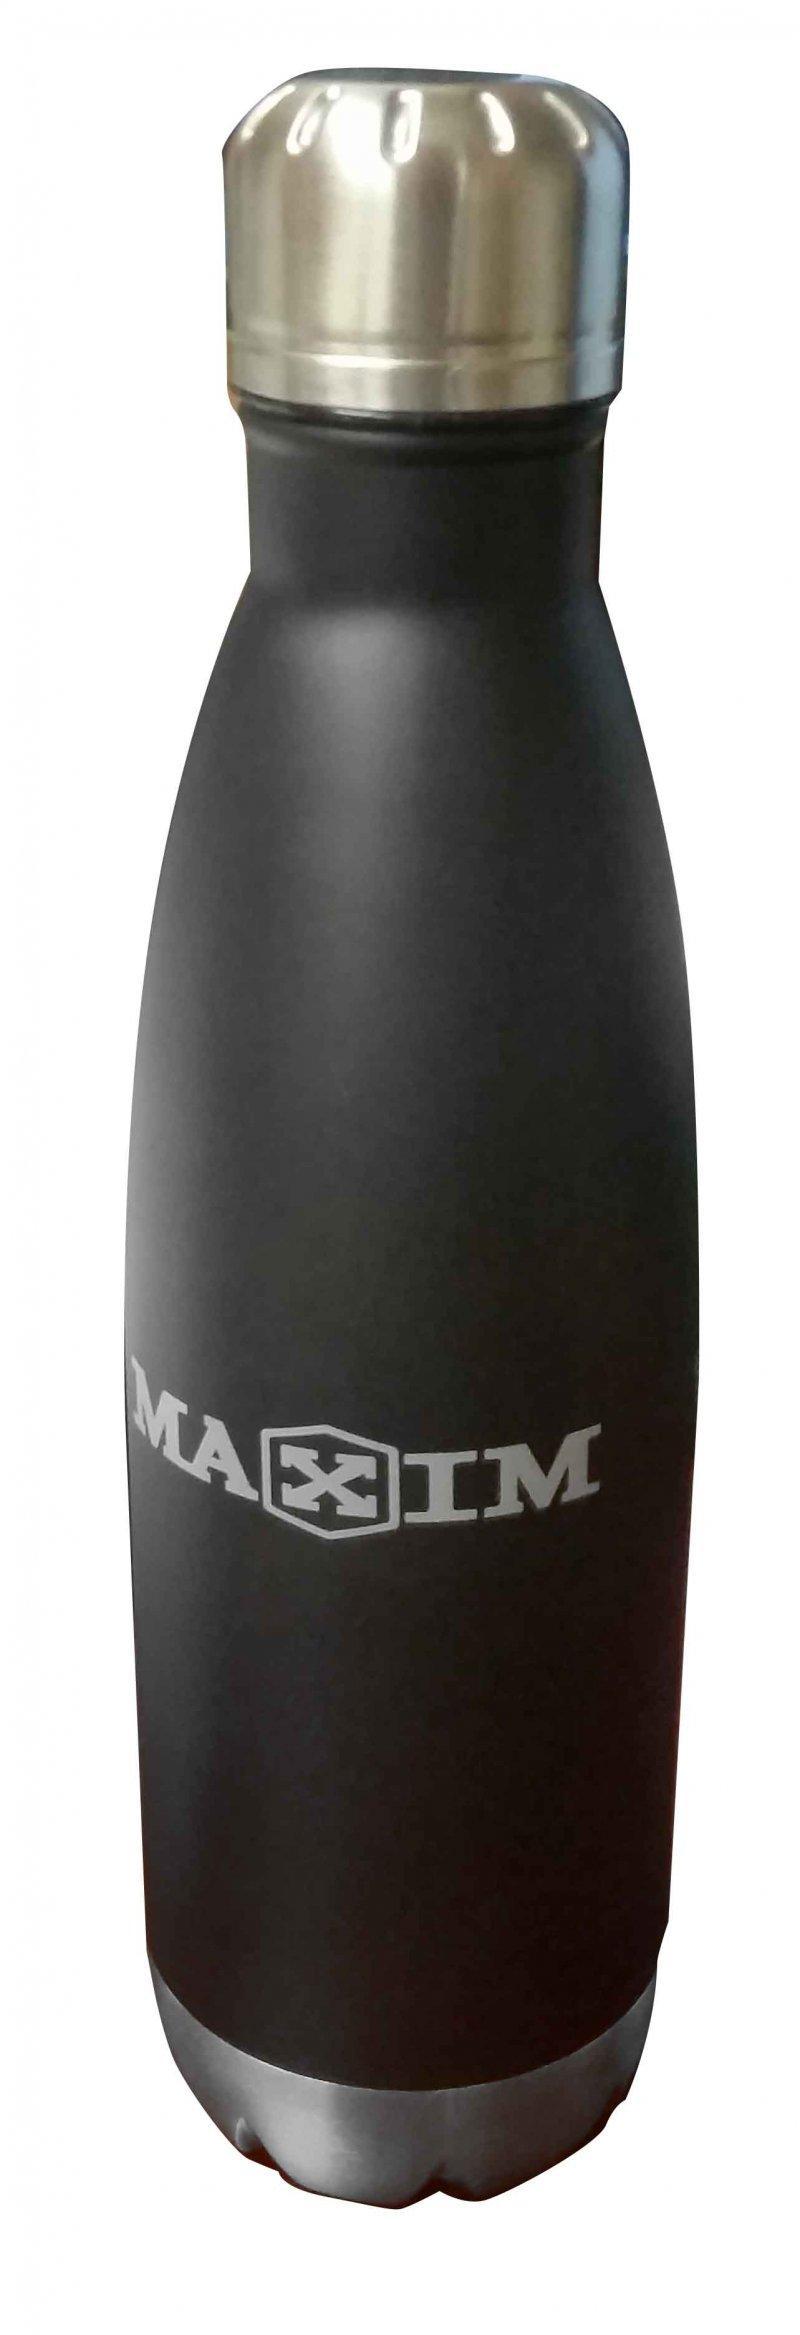 STAINLESS STEEL, INSULATED WATERBOTTLE,BLACK MAXIM - MXWB01